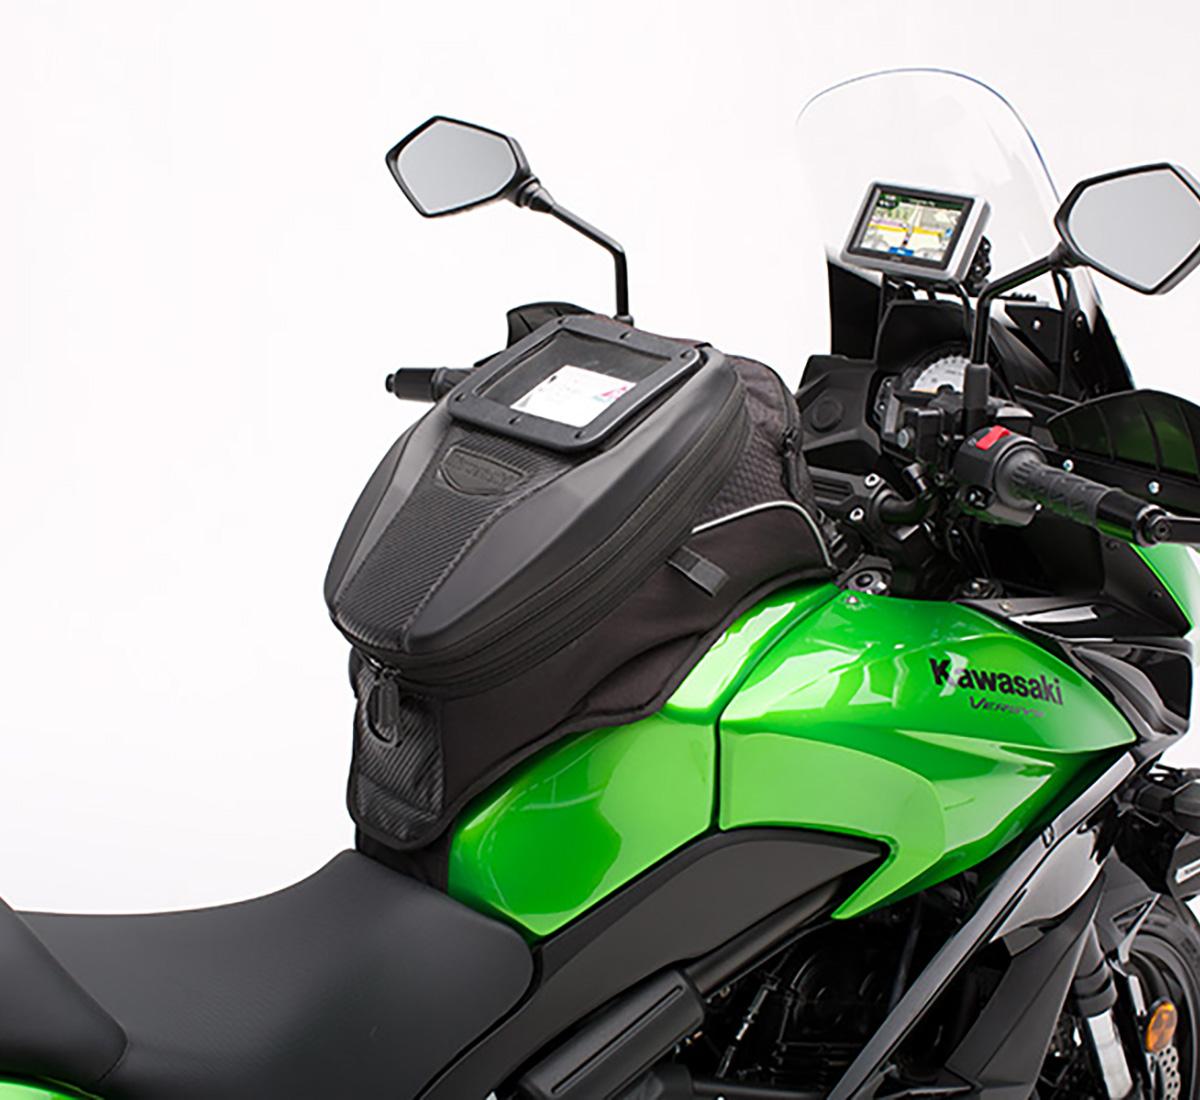 hight resolution of 2018 versys 650 lt versys motorcycle by kawasaki rh kawasaki com 2018 kawasaki versys 650 2015